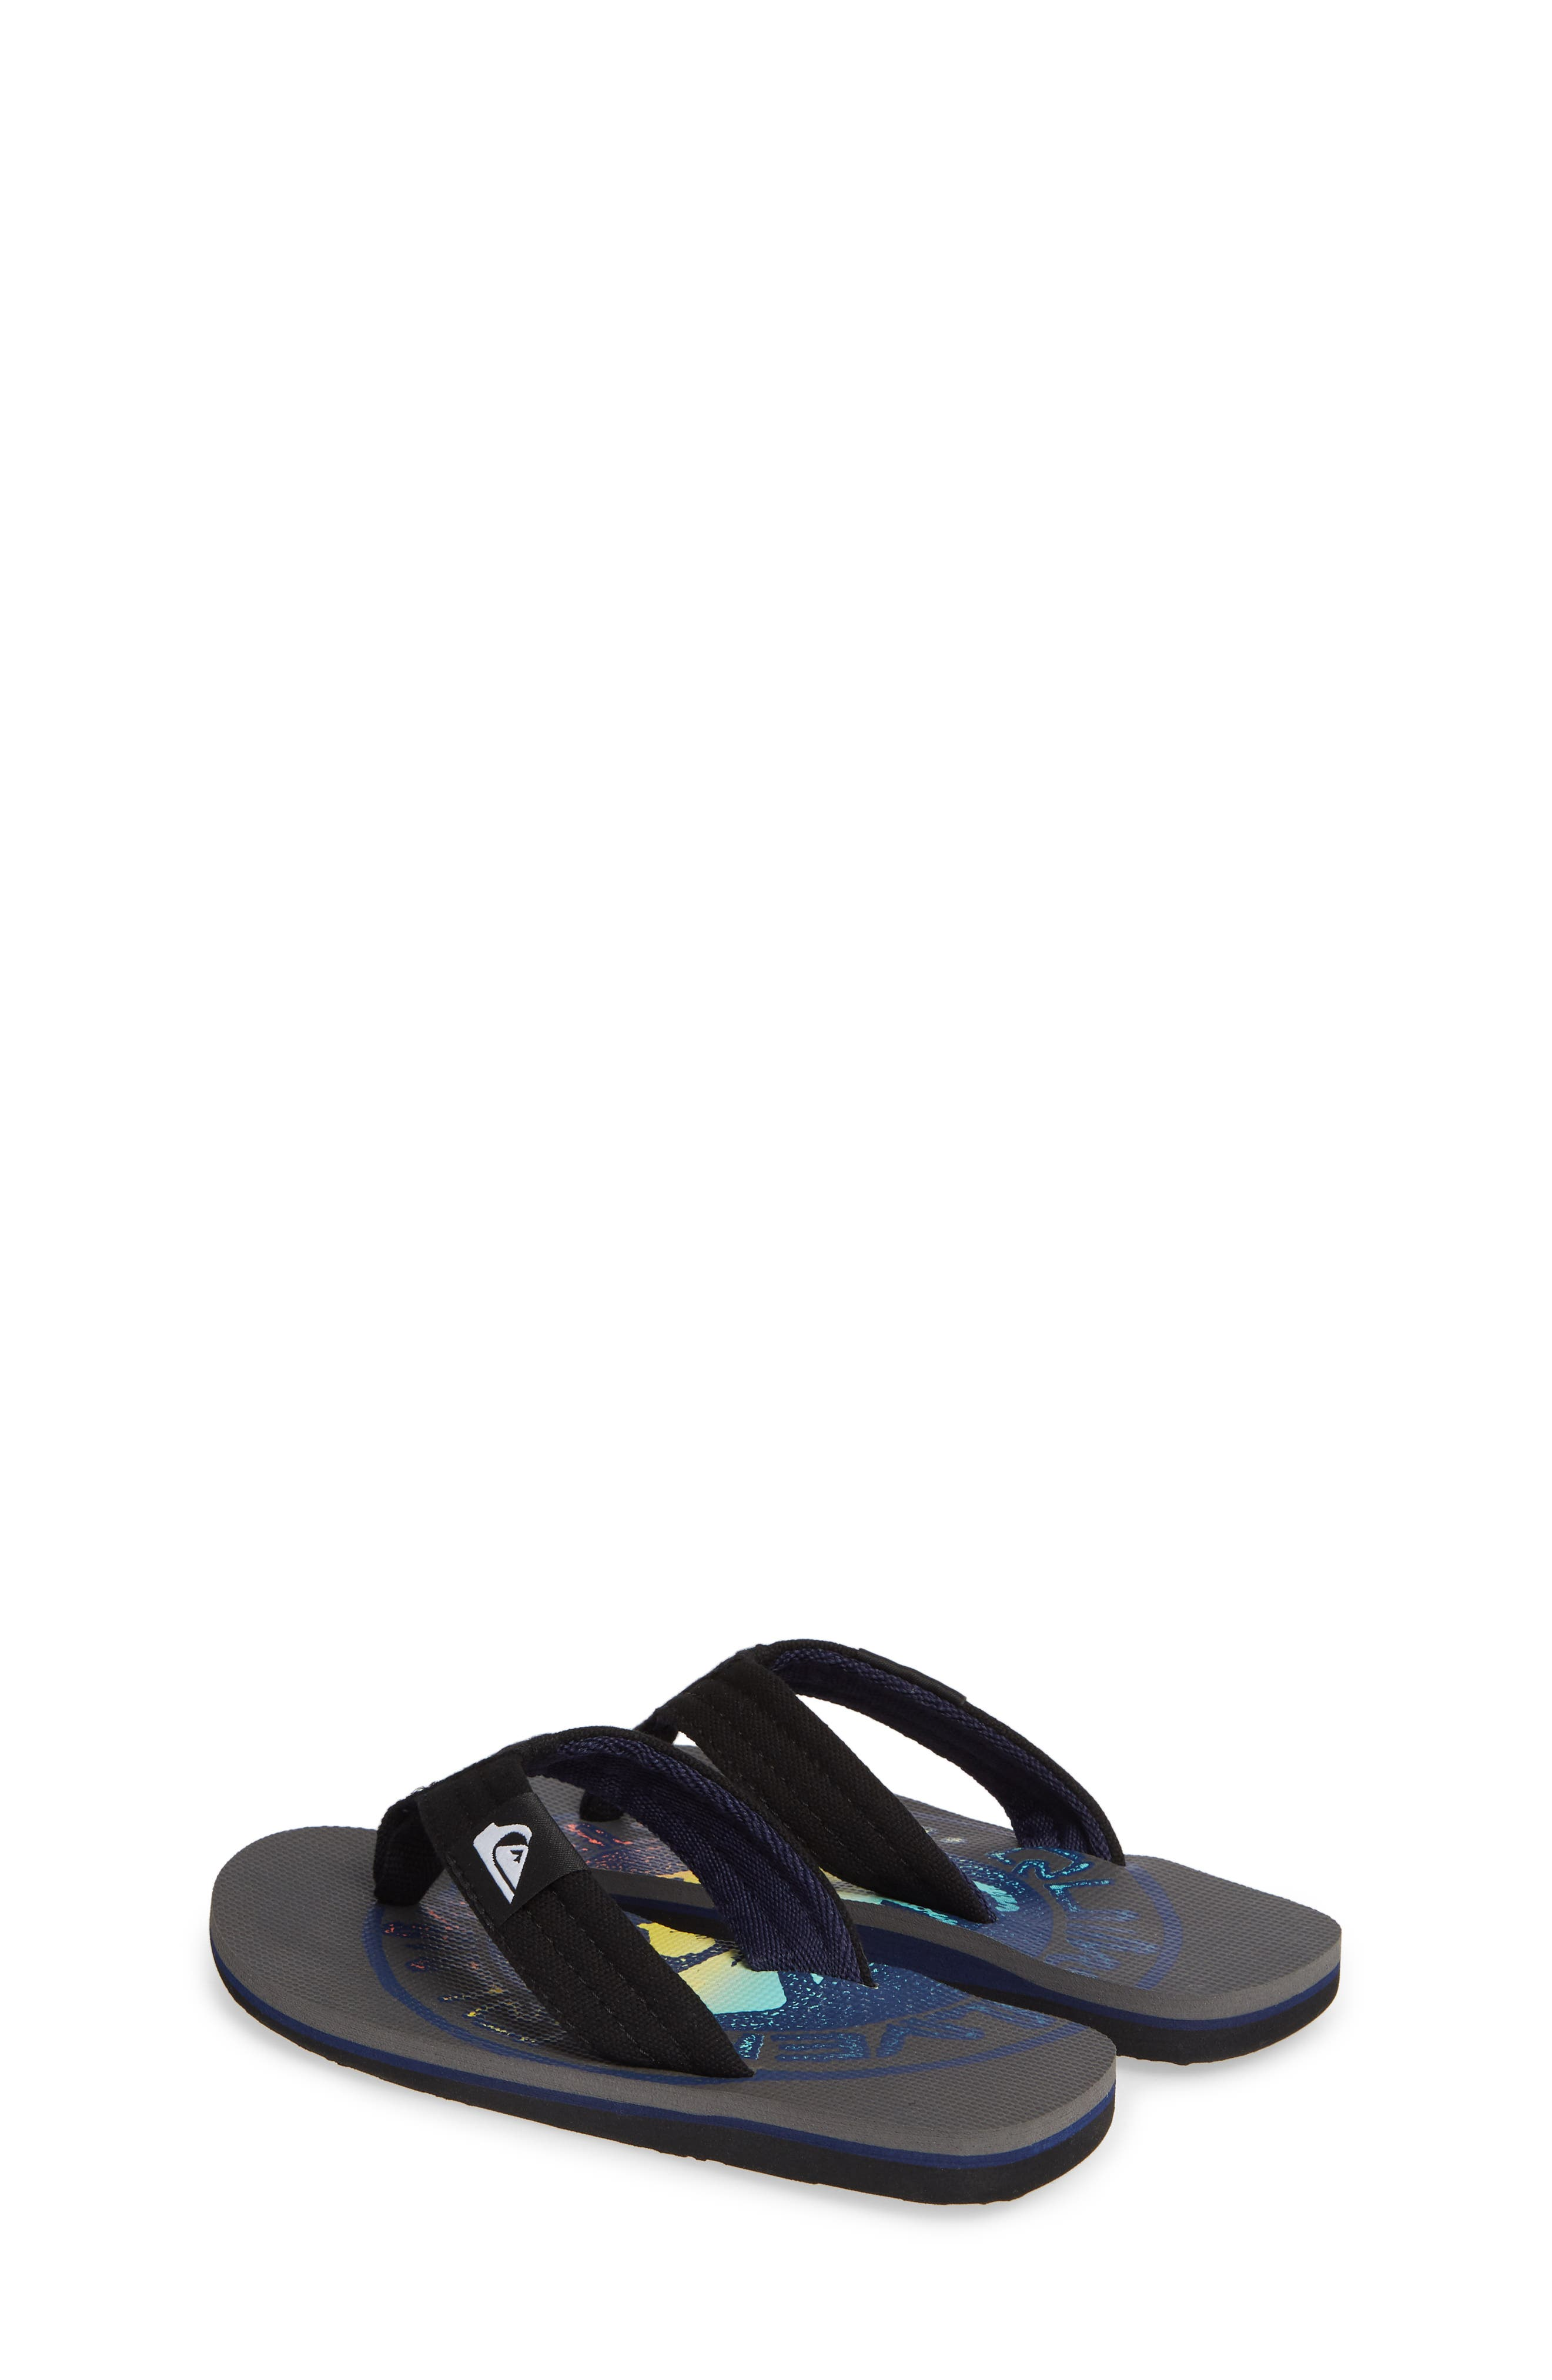 QUIKSILVER, Molokai Layback Flip Flop, Alternate thumbnail 3, color, GREY/ BLACK/ BLUE